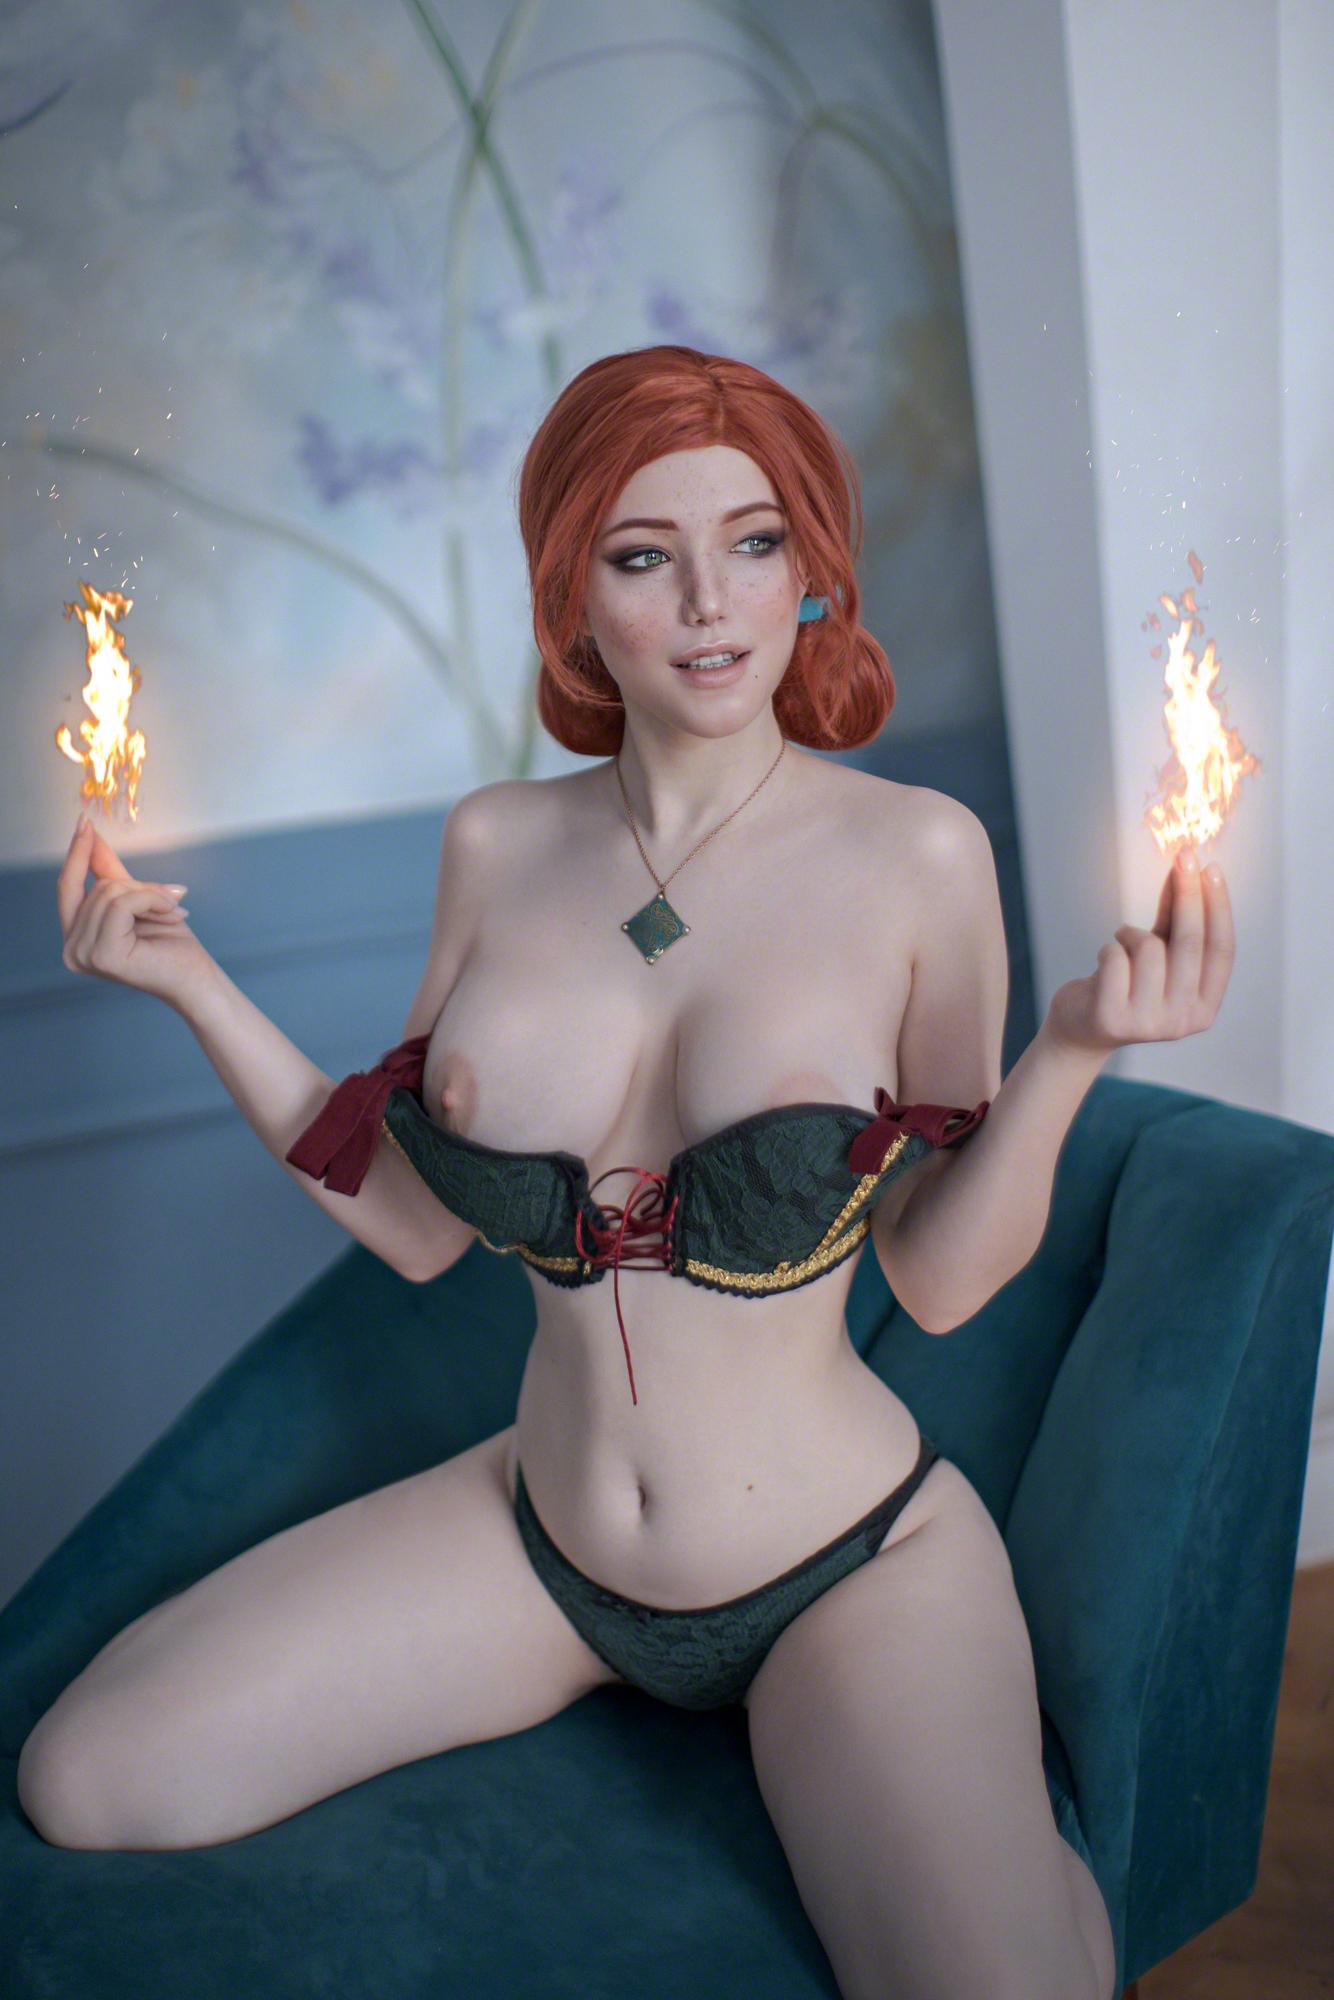 Leaked Nude Set From Lada Lyumos Patreon 0020